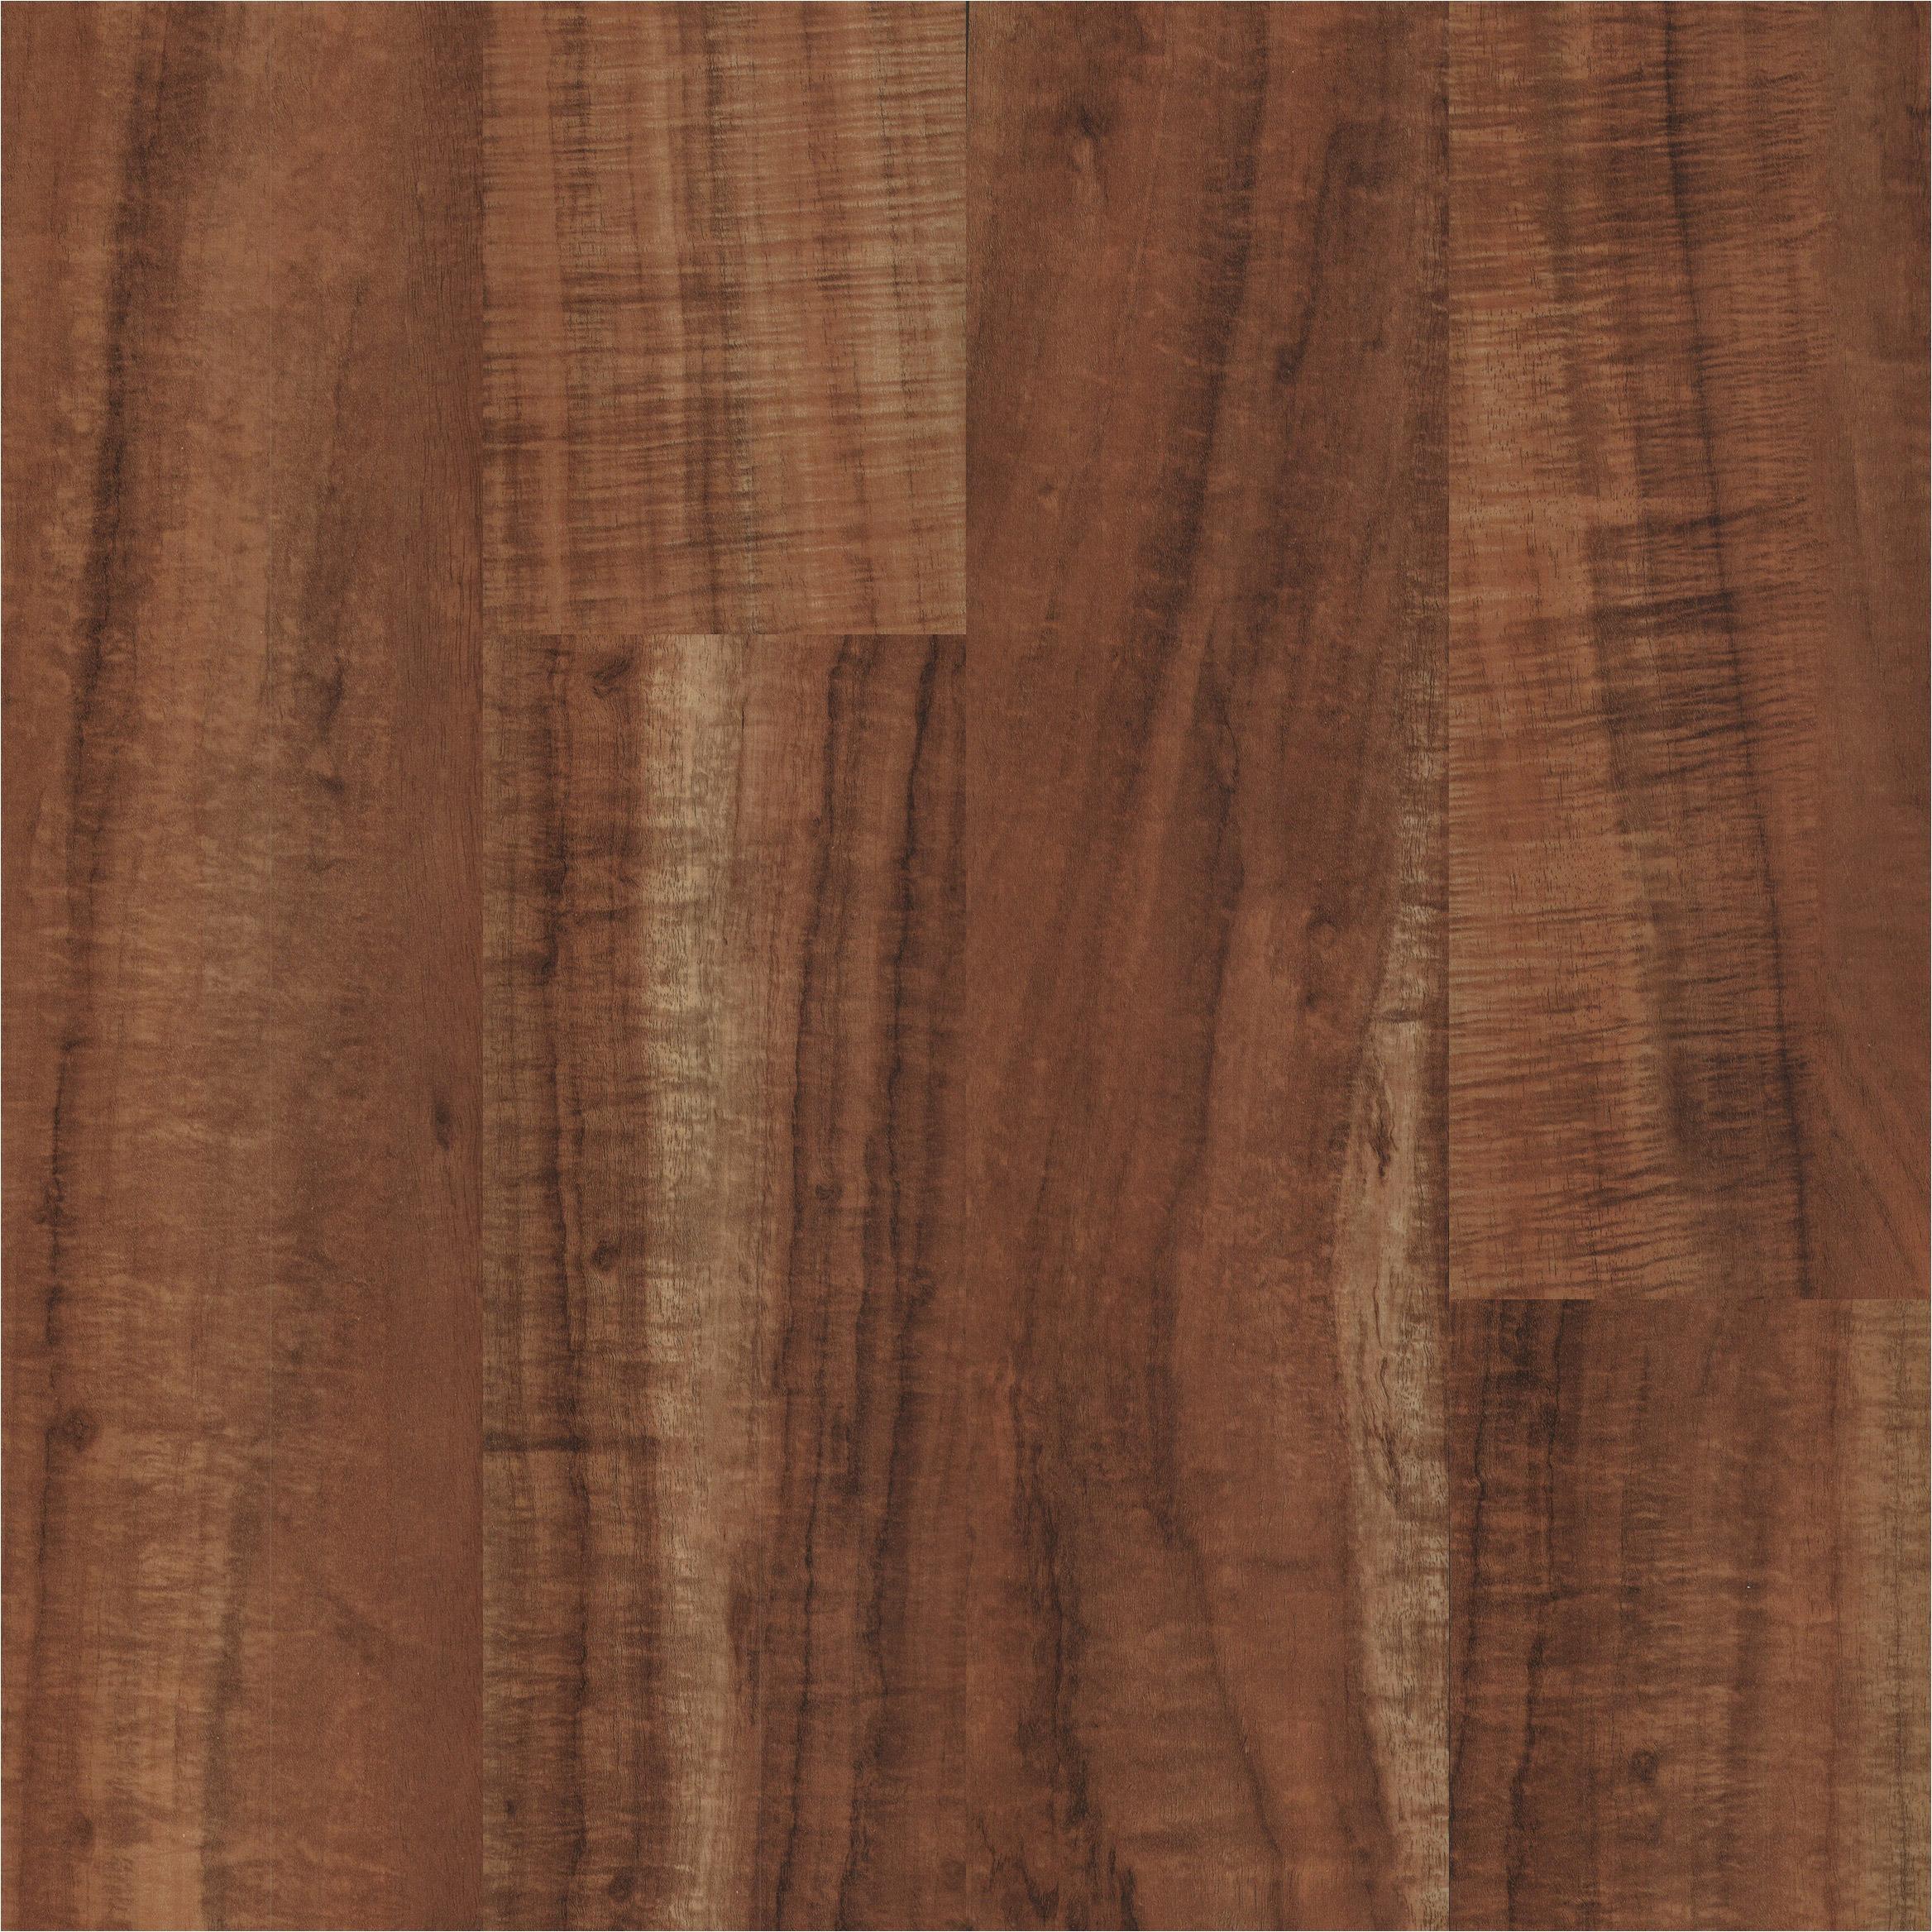 ivc moduleo horizon serengeti cherry 6 wide waterproof click together lvt vinyl plank flooring